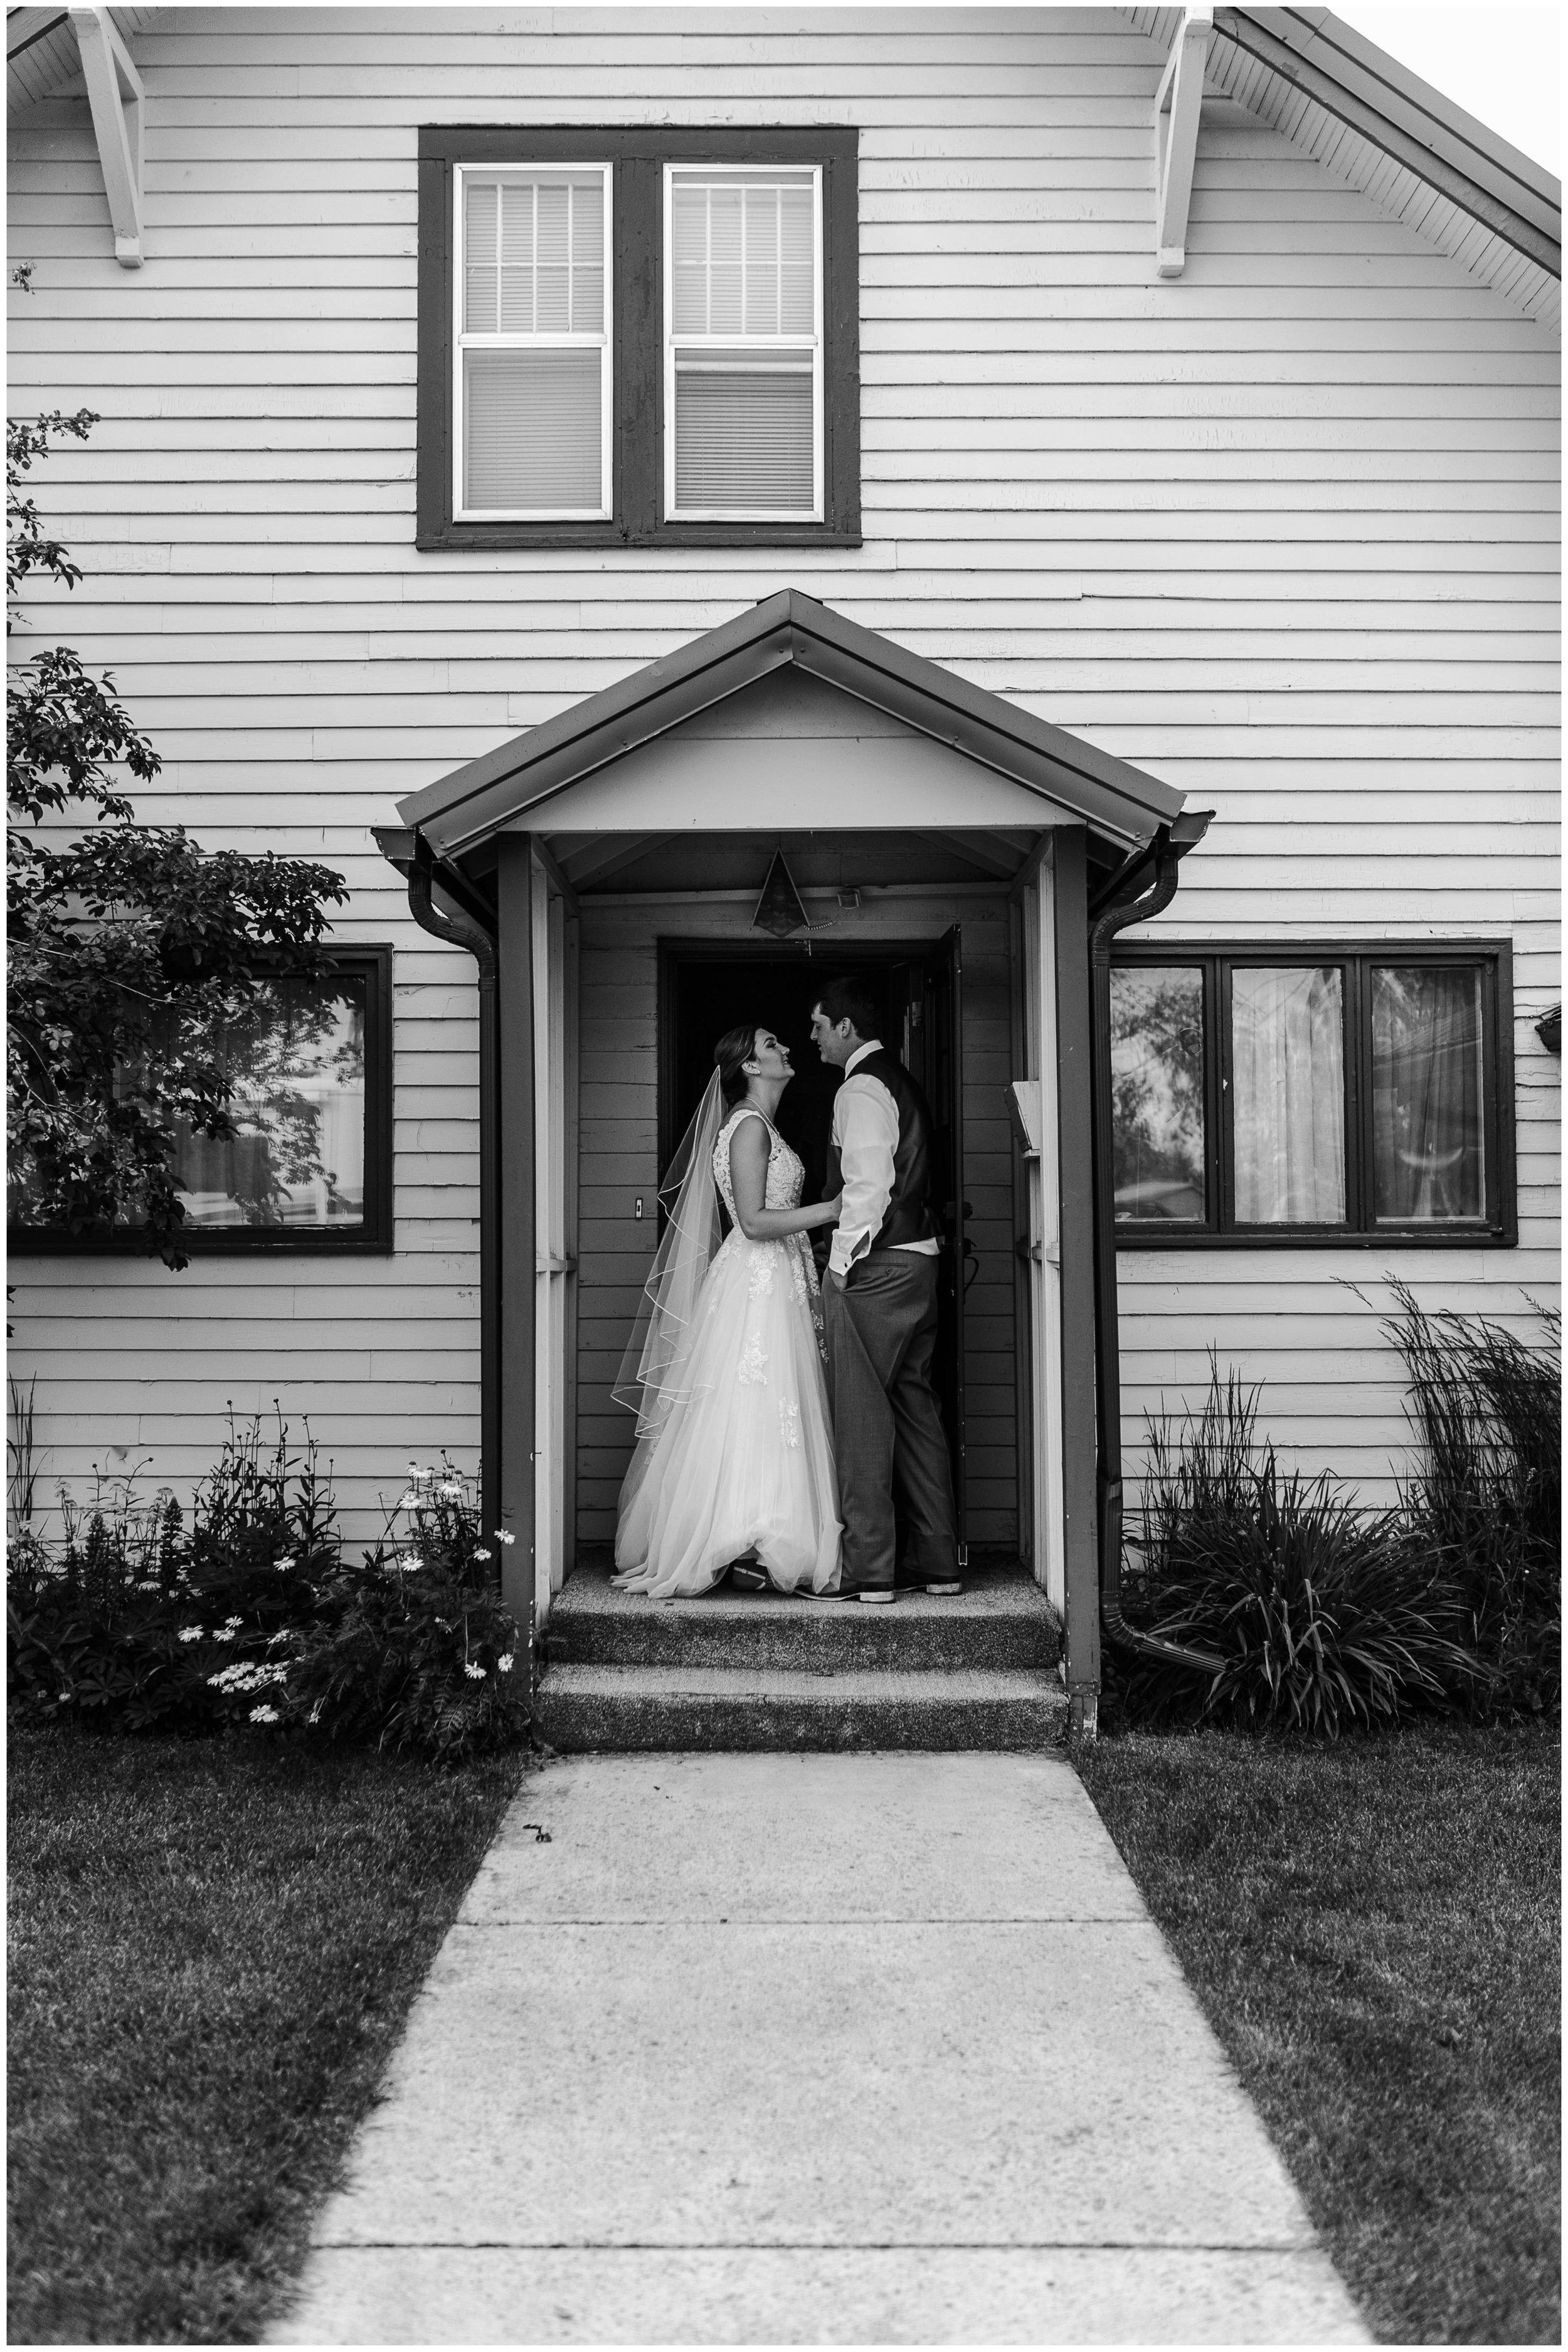 malia_clint_valier_rural_wedding_p27.jpg